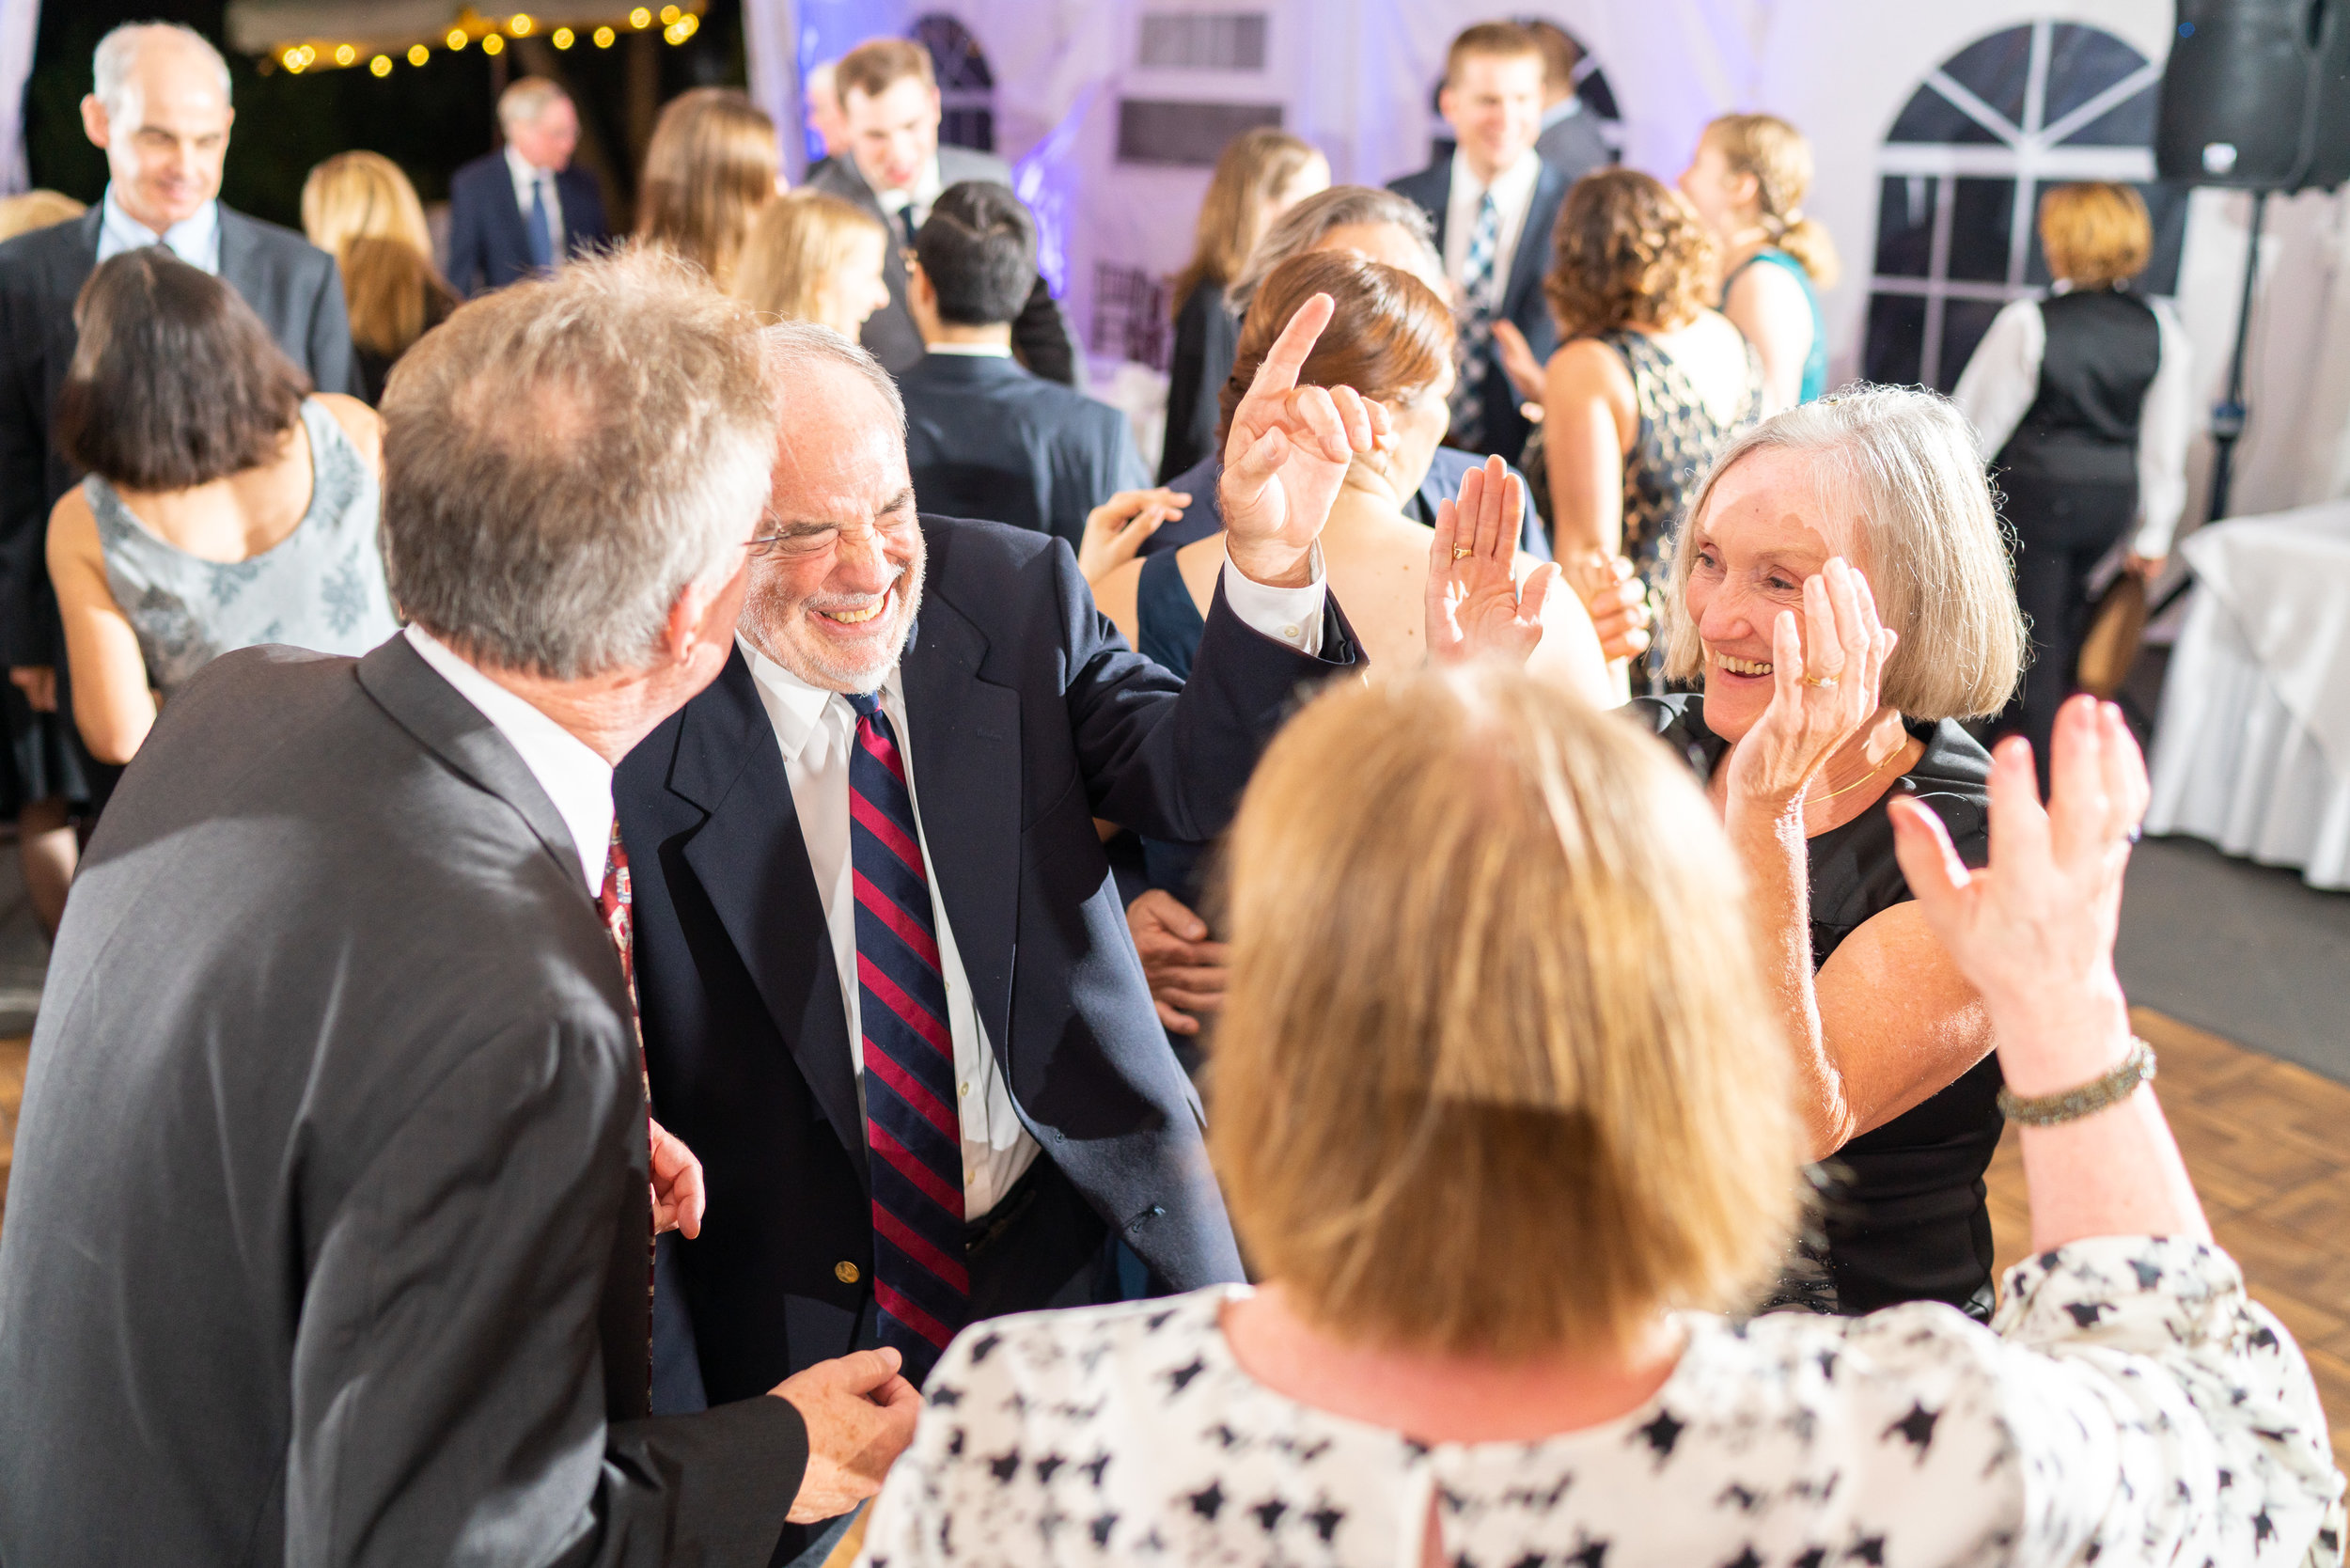 Family dancing during wedding reception at Elkridge Furnace Inn